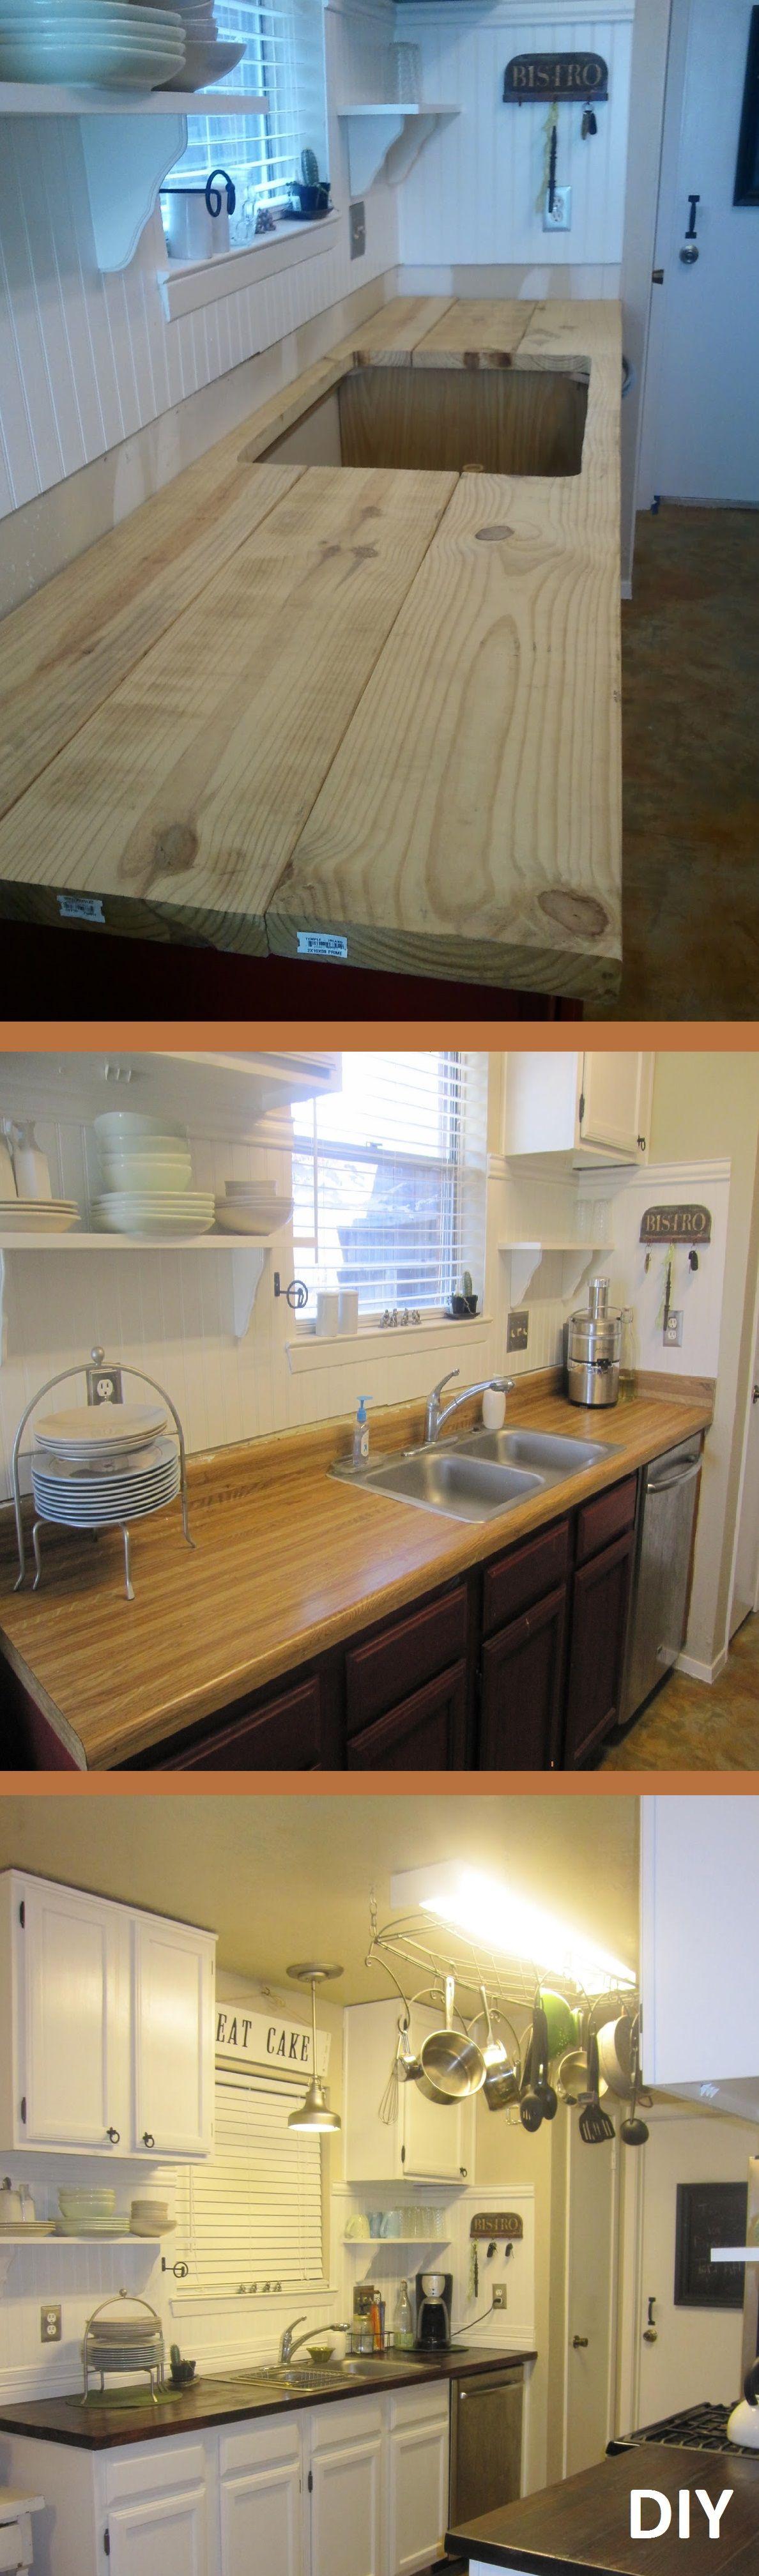 Home Wooden DIY Projects 11 | Pinterest | Küchen-Arbeitsplatten ...